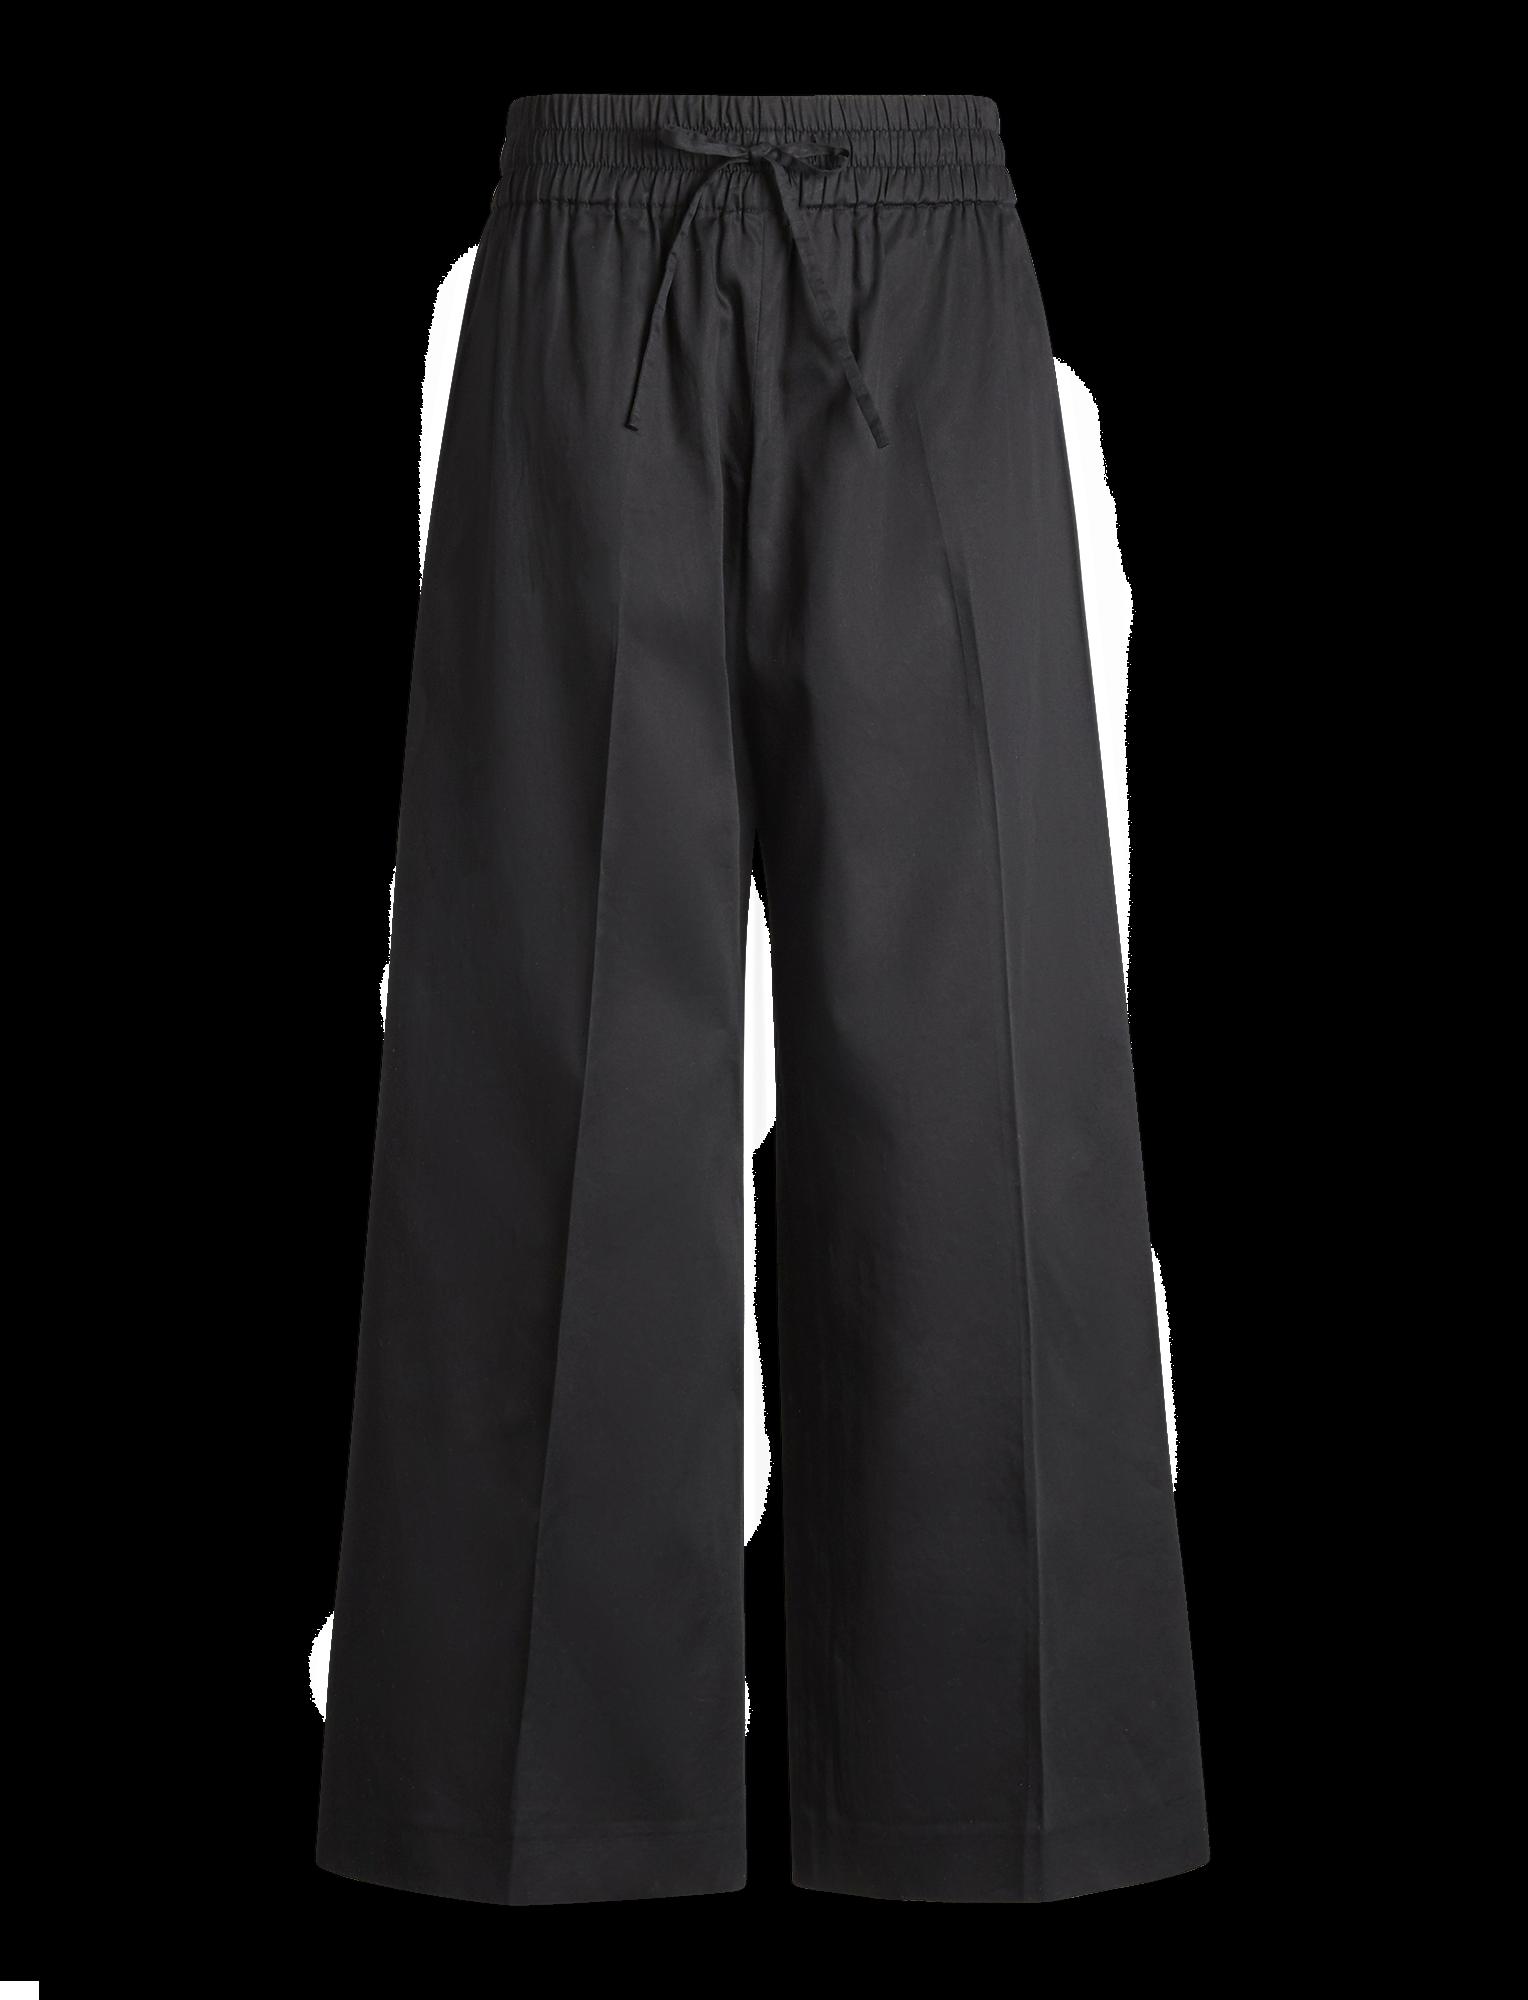 Joseph, Dahlman Refined Cotton Trousers, in BLACK